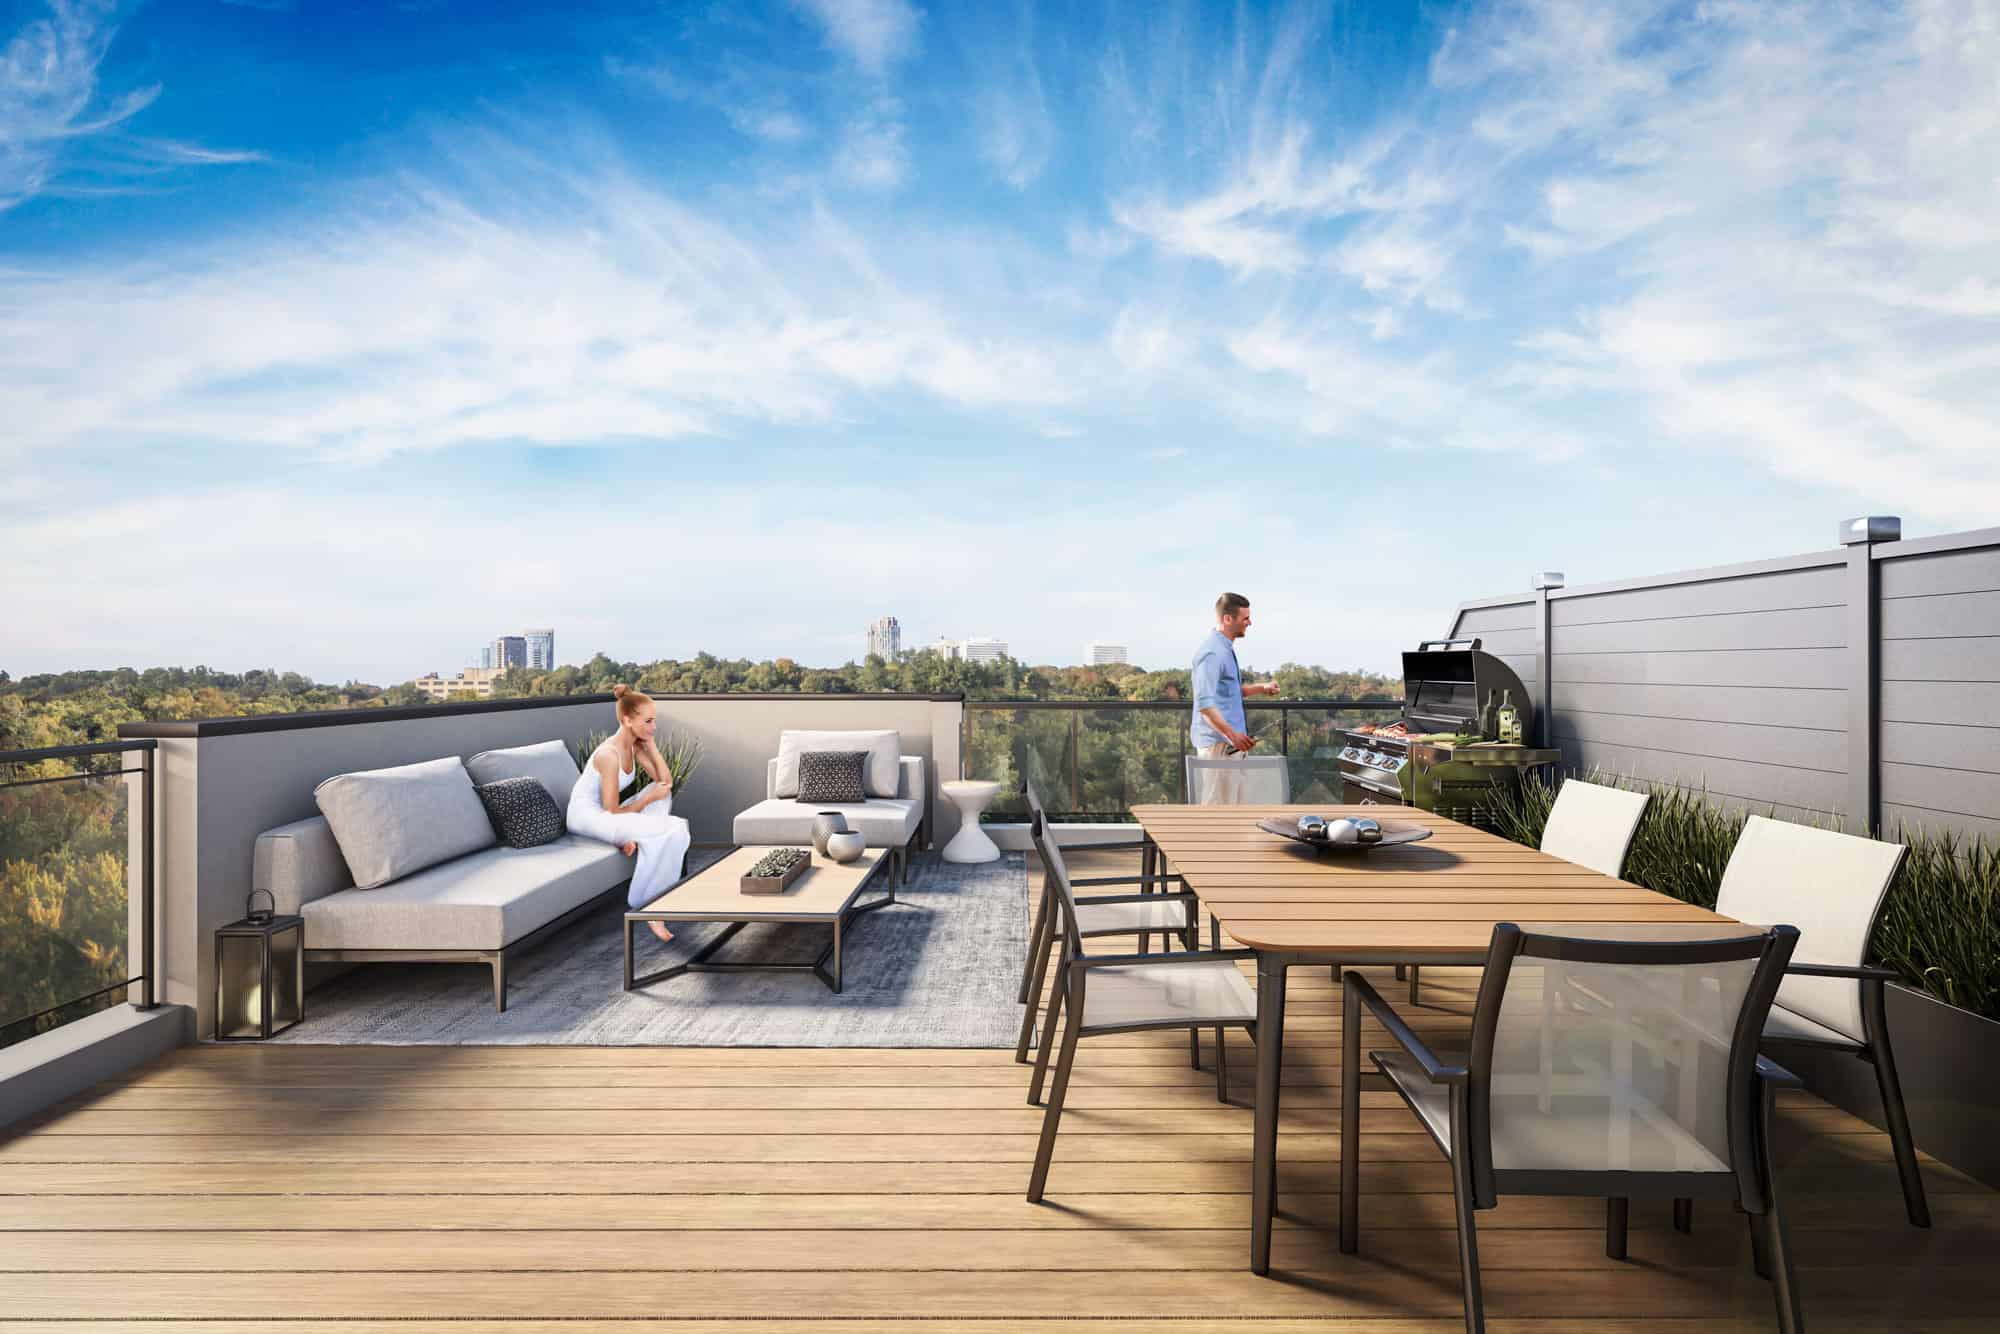 Image: Rendering Of Rooftop Terrace